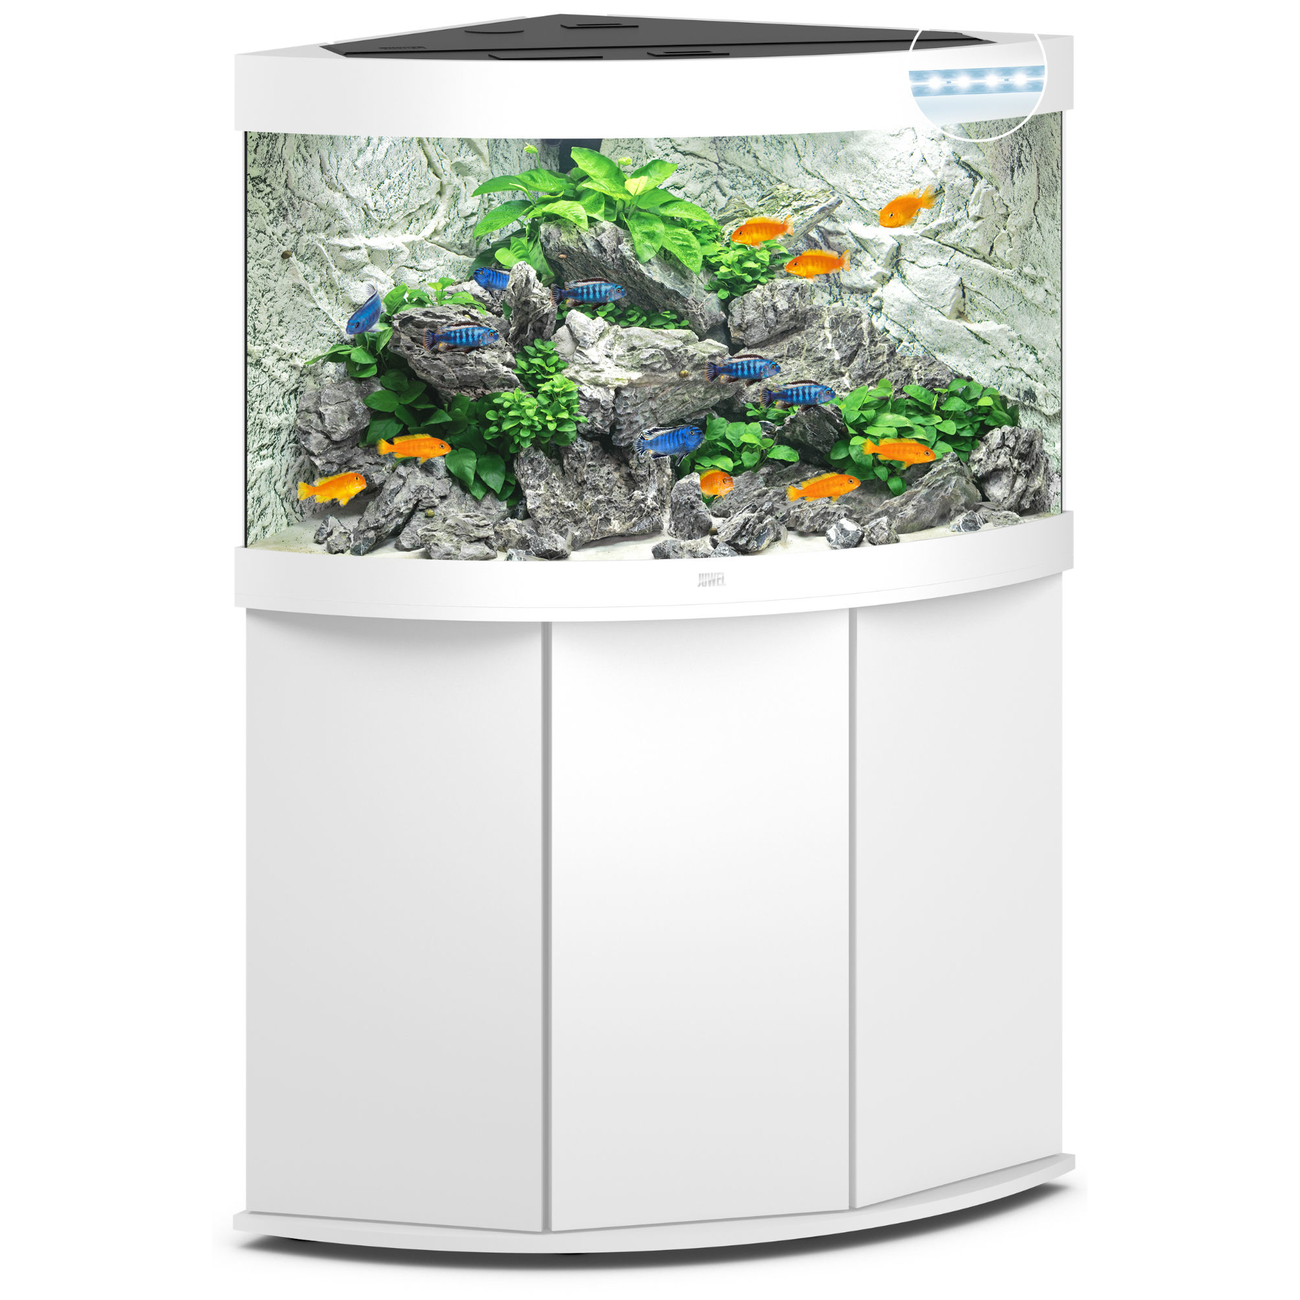 Juwel Trigon 190 LED Eck-Aquarium mit Unterschrank Bild 7